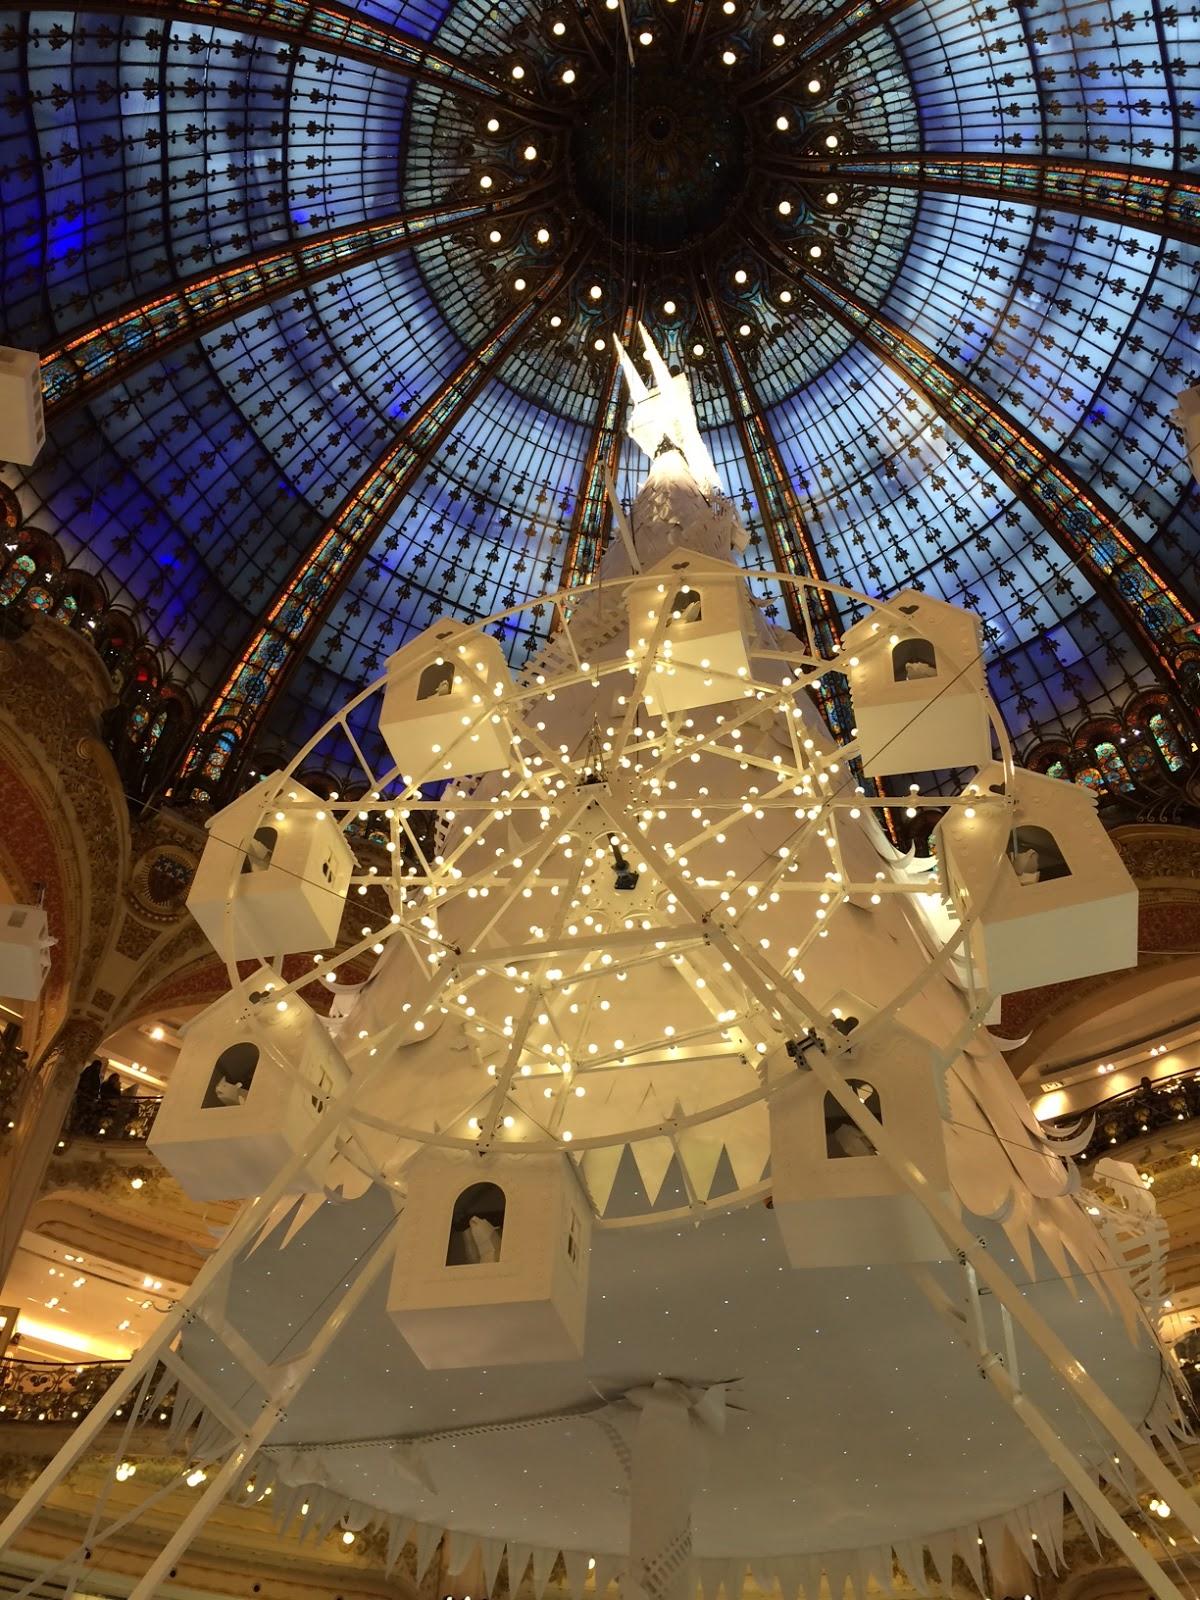 #A07D2B Say Oui To Paris: 2016 Holiday Decorations At Galeries  5431 décorations de noel galeries lafayette 1200x1600 px @ aertt.com